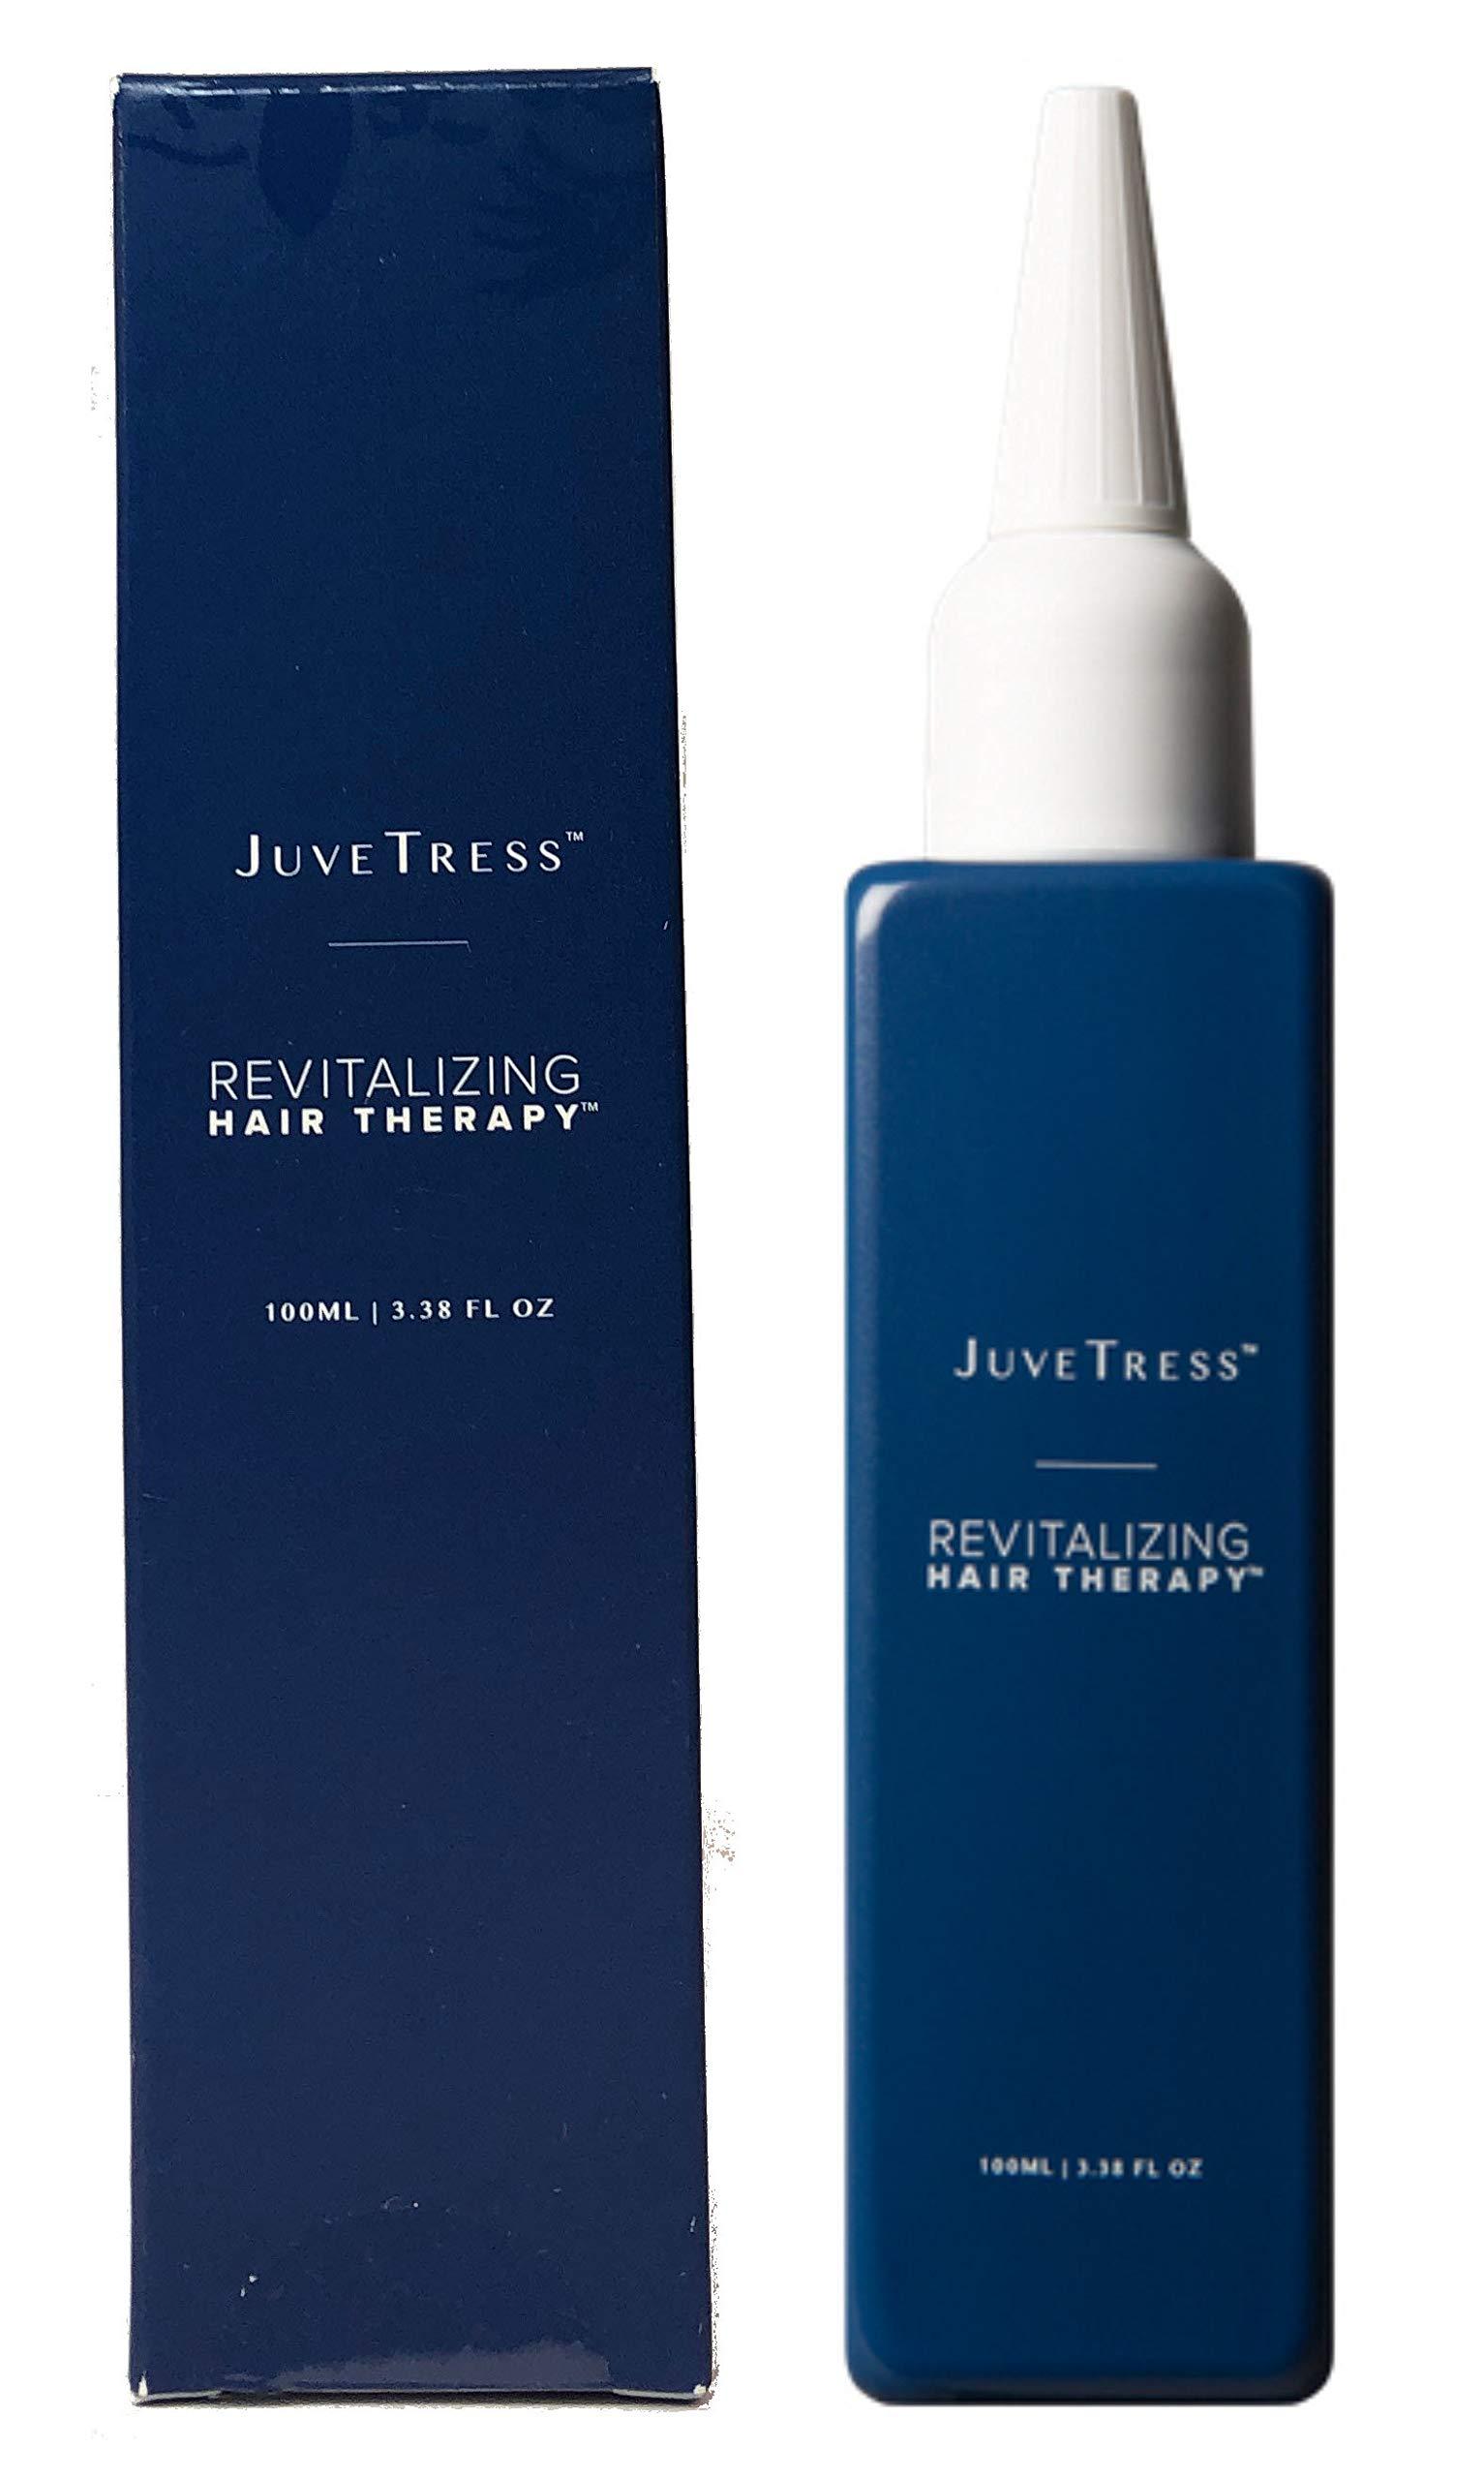 JuveTress Revitalizing Hair Therapy (New Formula) - 3.38 fl oz, 100 Milliliter Bottle